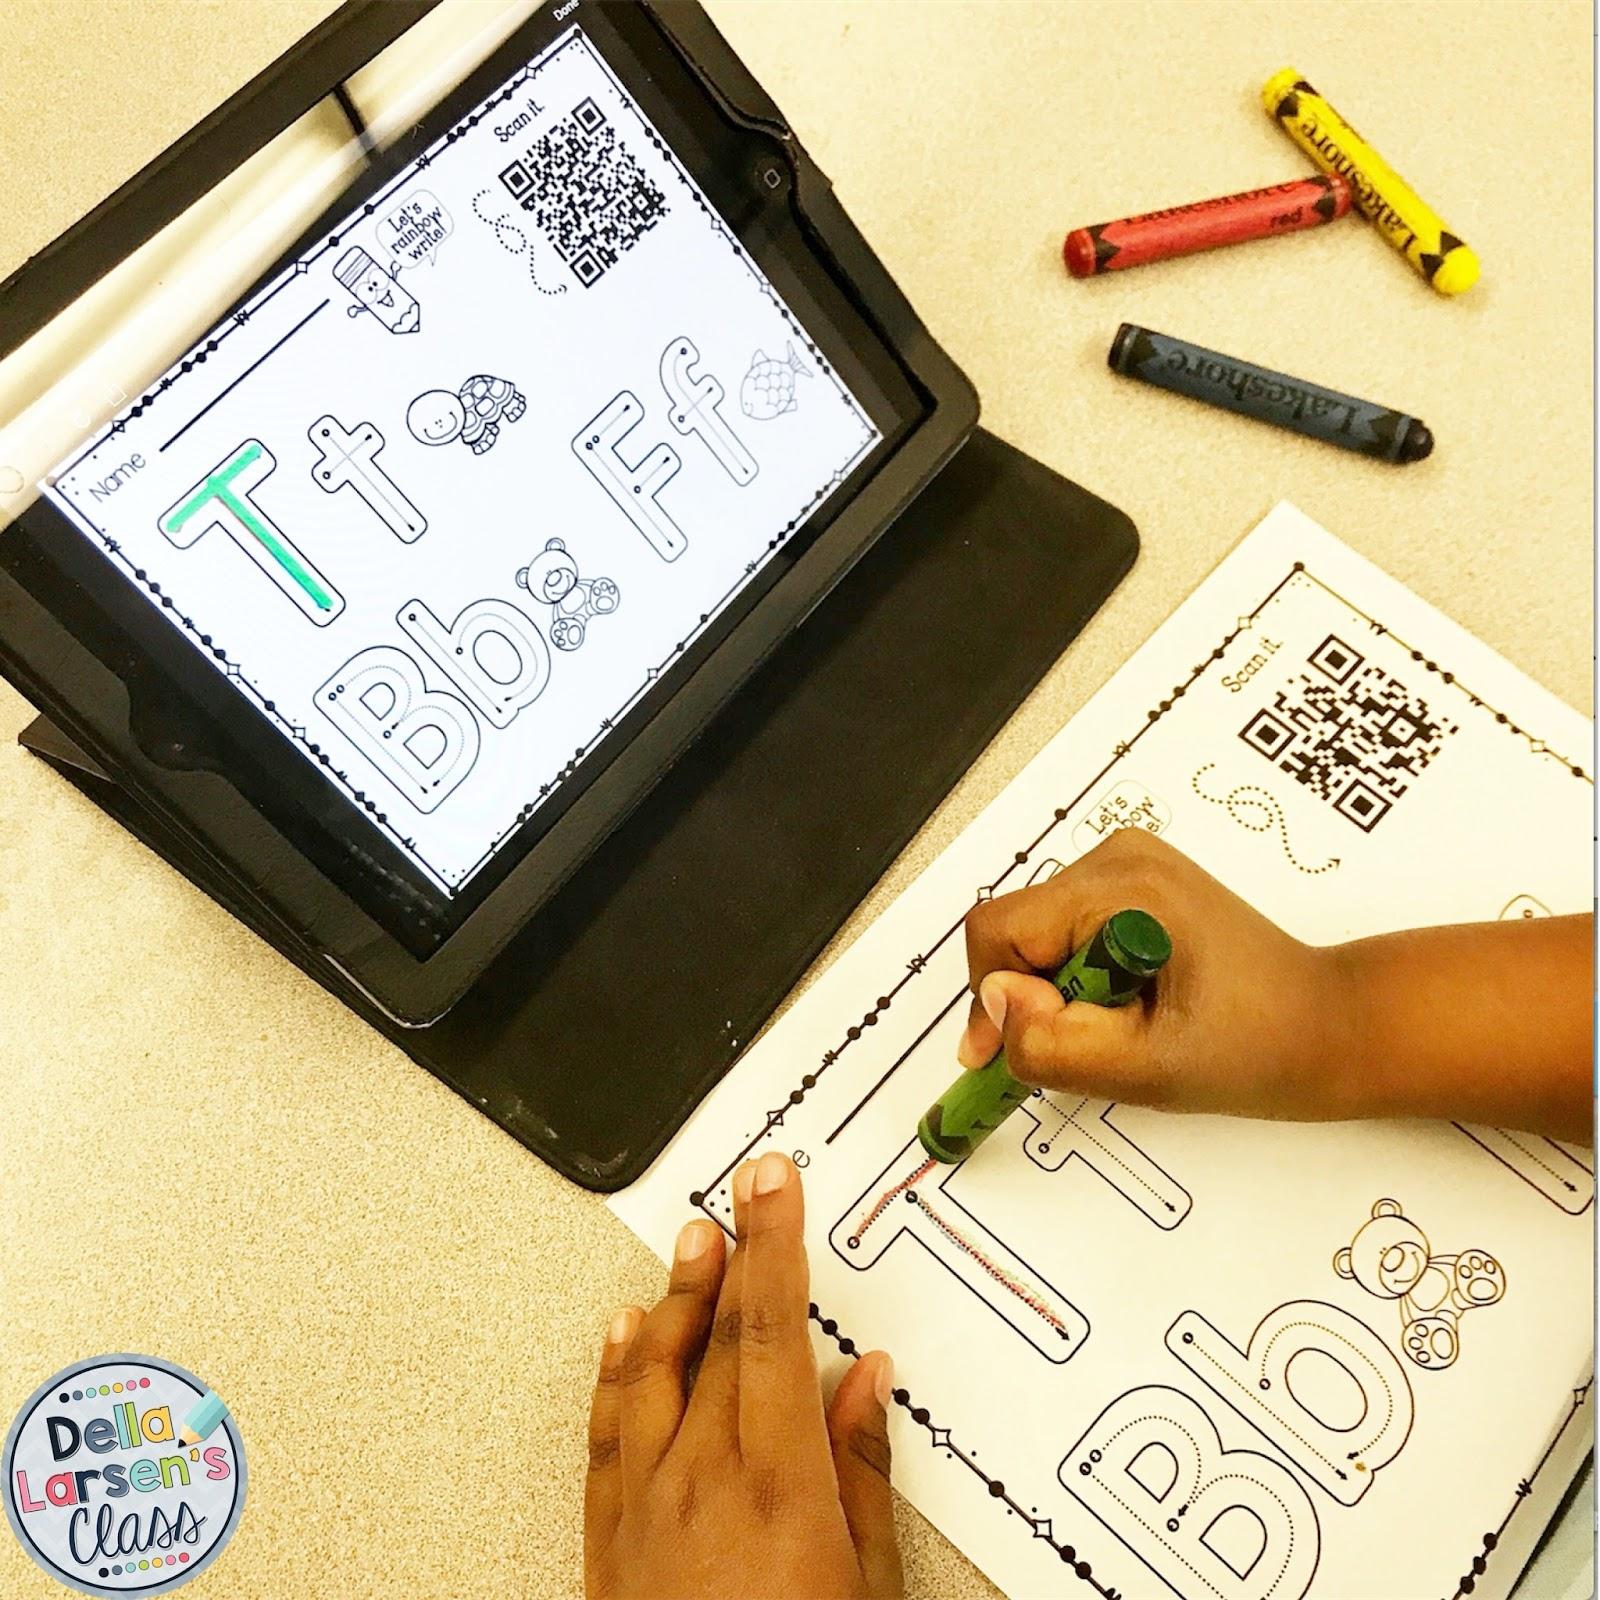 Della Larsen S Class New Ideas For Teaching Handwriting